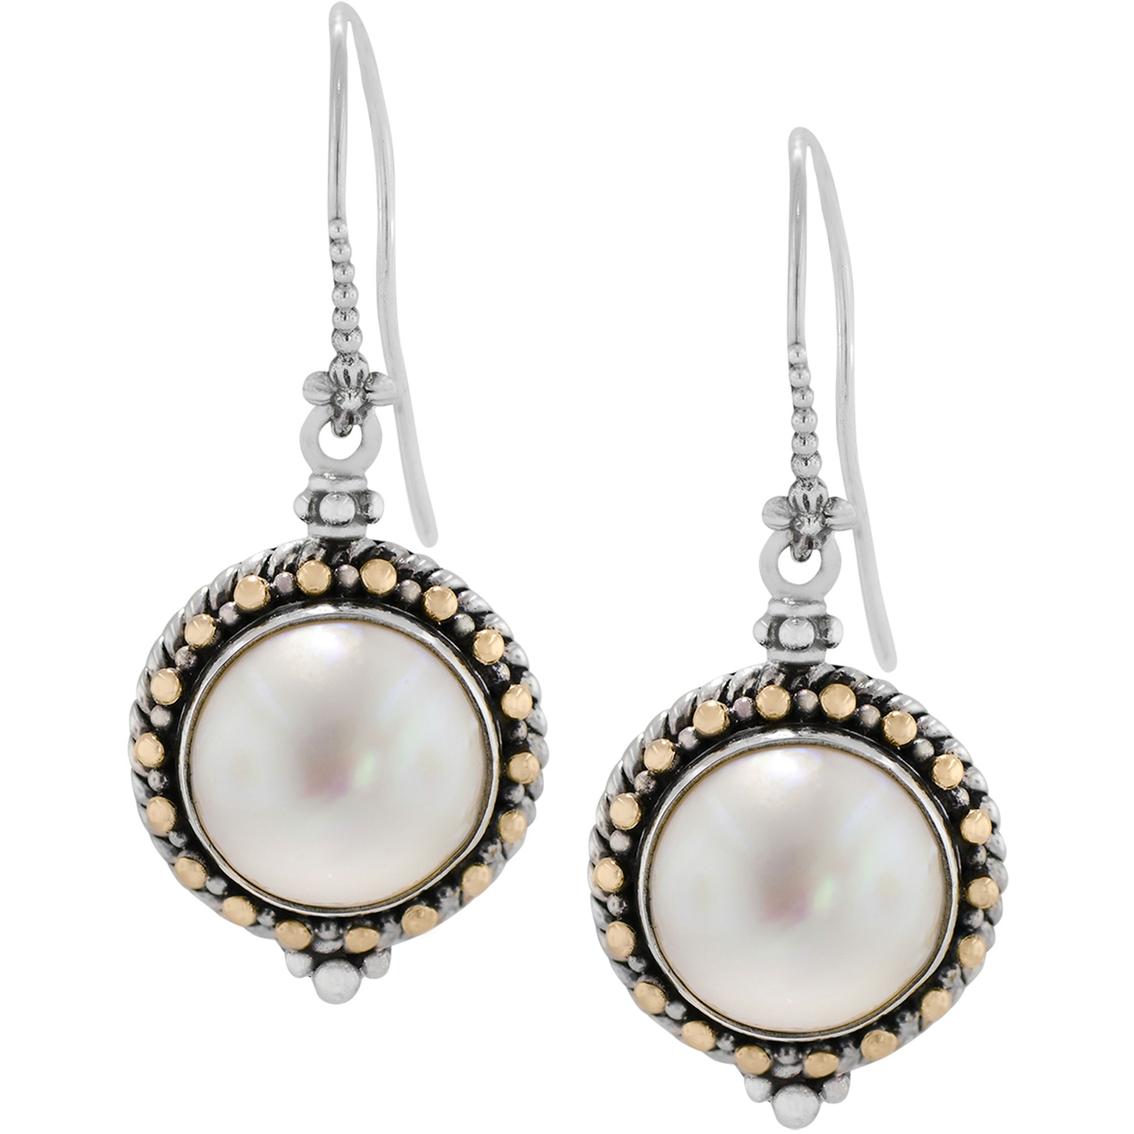 2f41f27d78067 Robert Manse Designs Bali Sterling Silver 18K Gold Mabe Pearl Drop Earrings